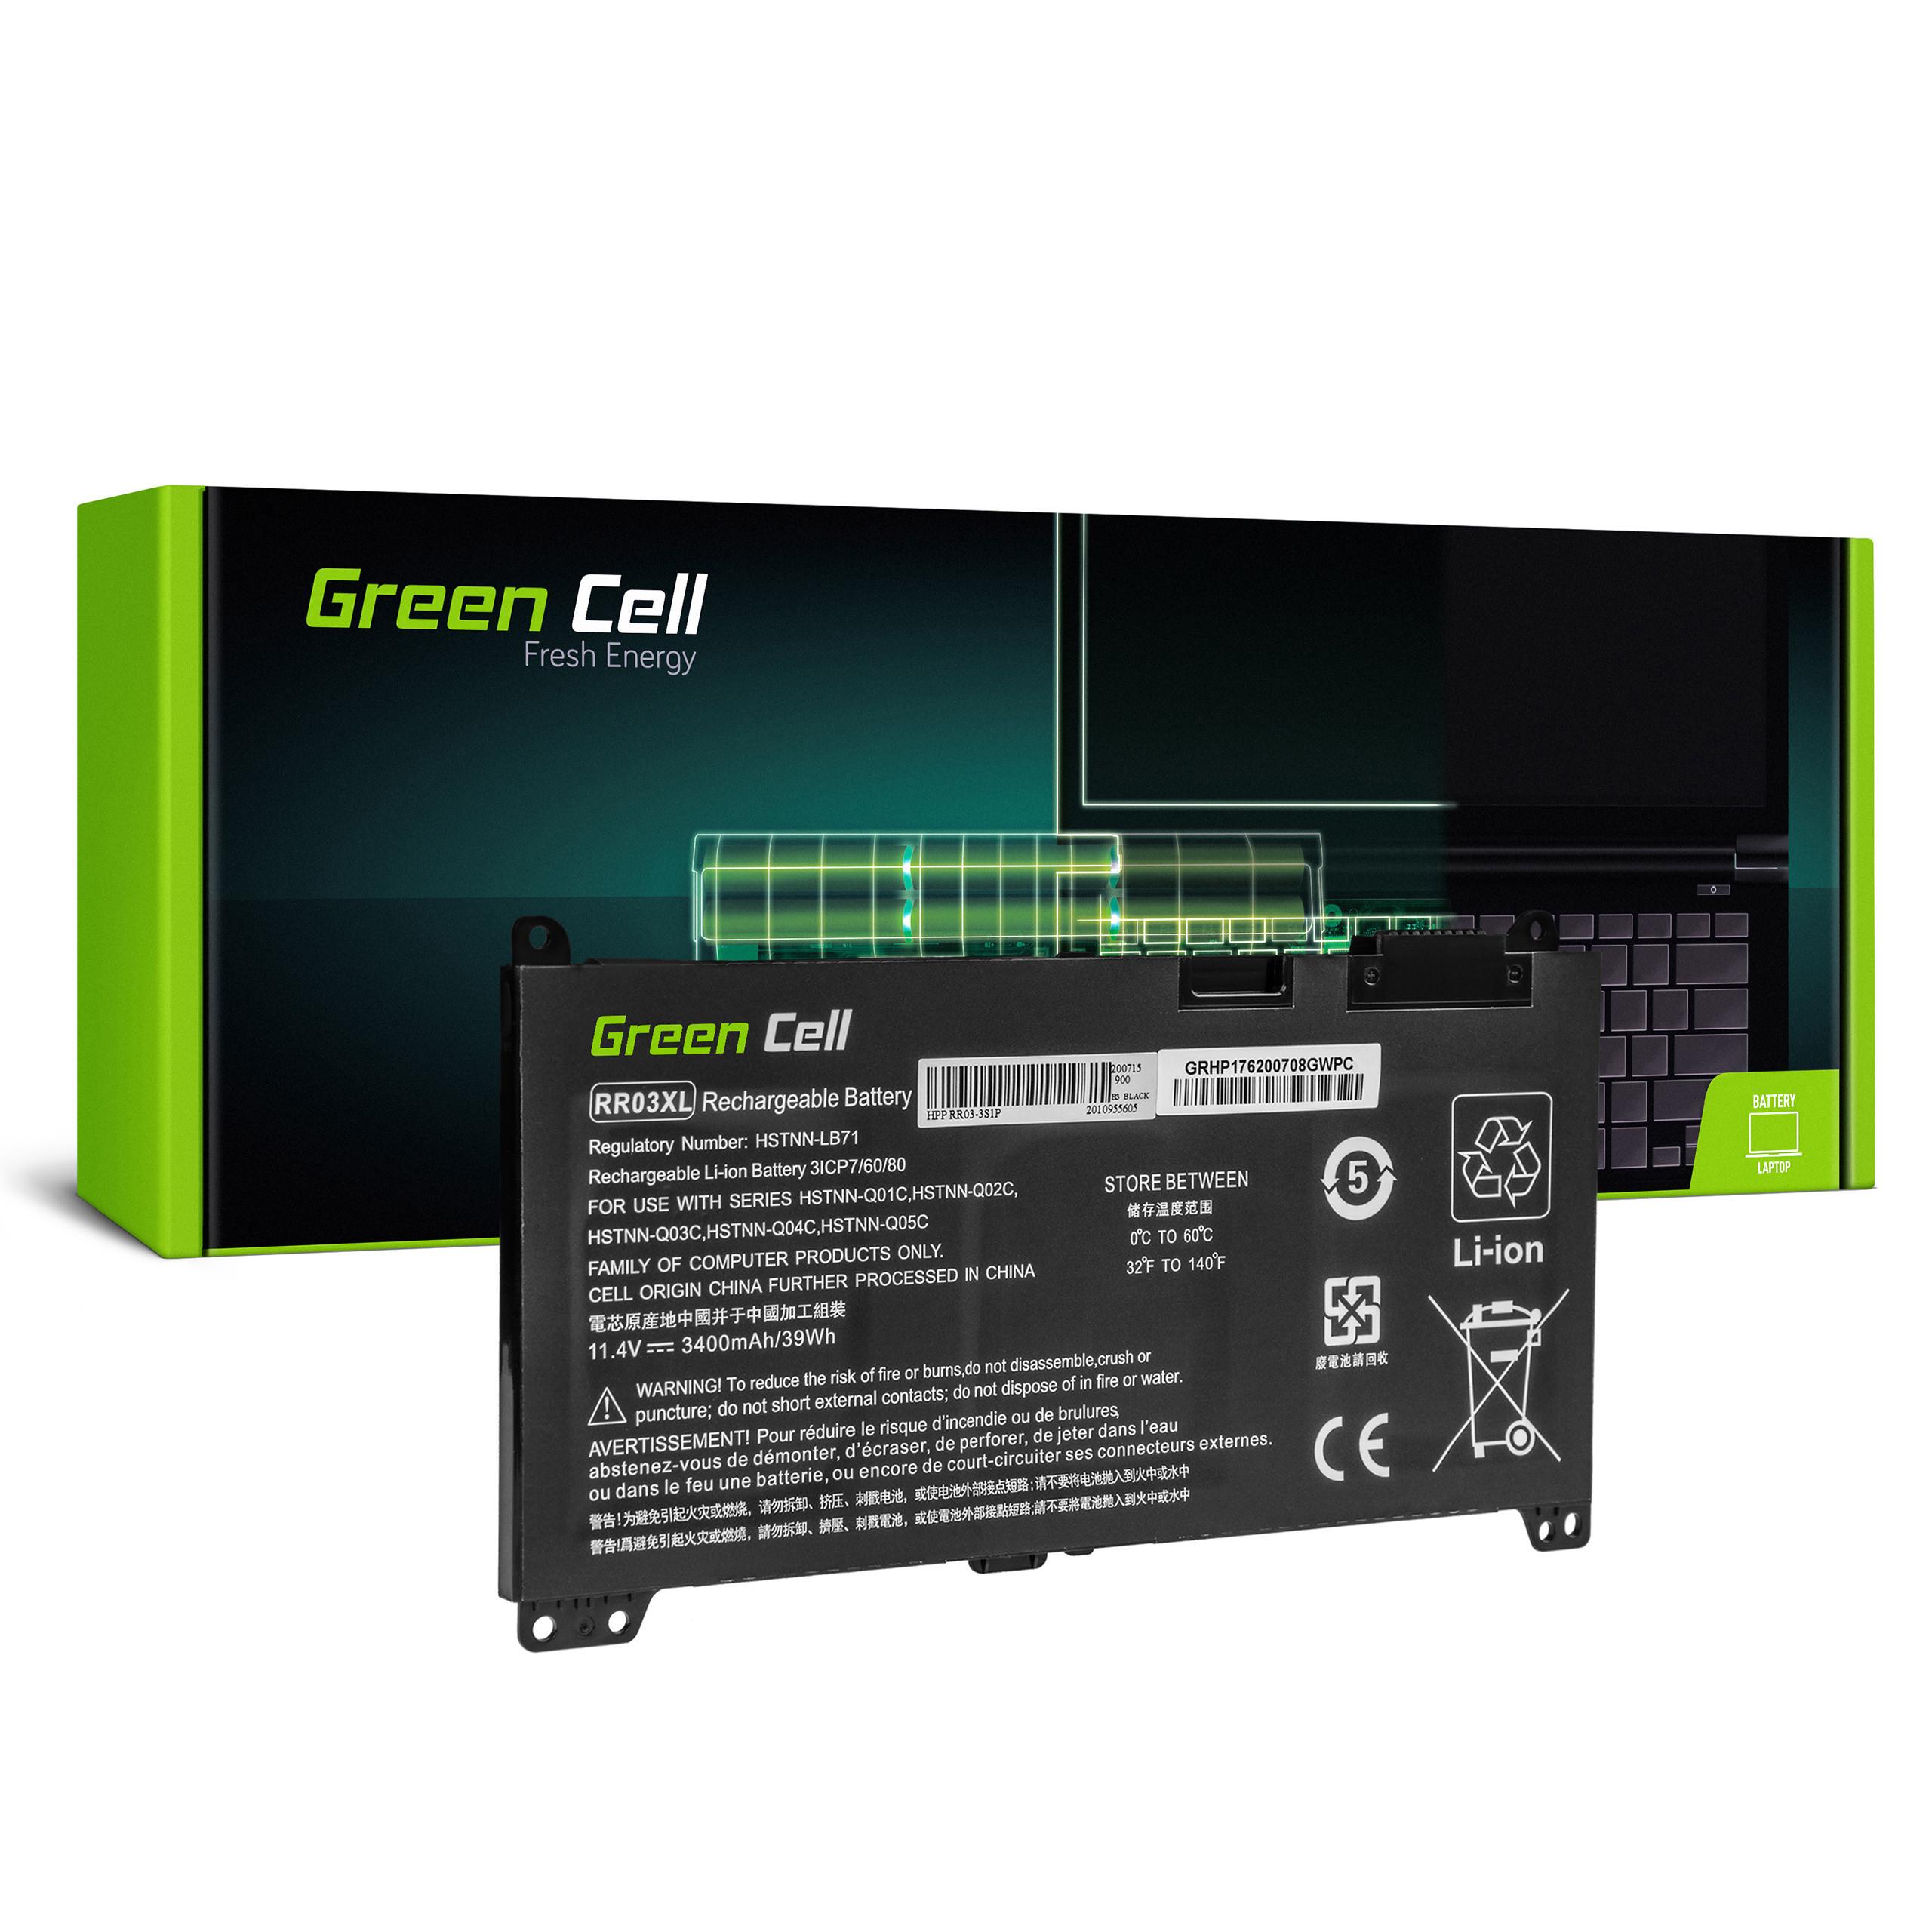 Battery RR03XL for HP ProBook 430 G4 G5 440 G4 G5 450 G4 G5 455 G4 G5 470 G4 G5